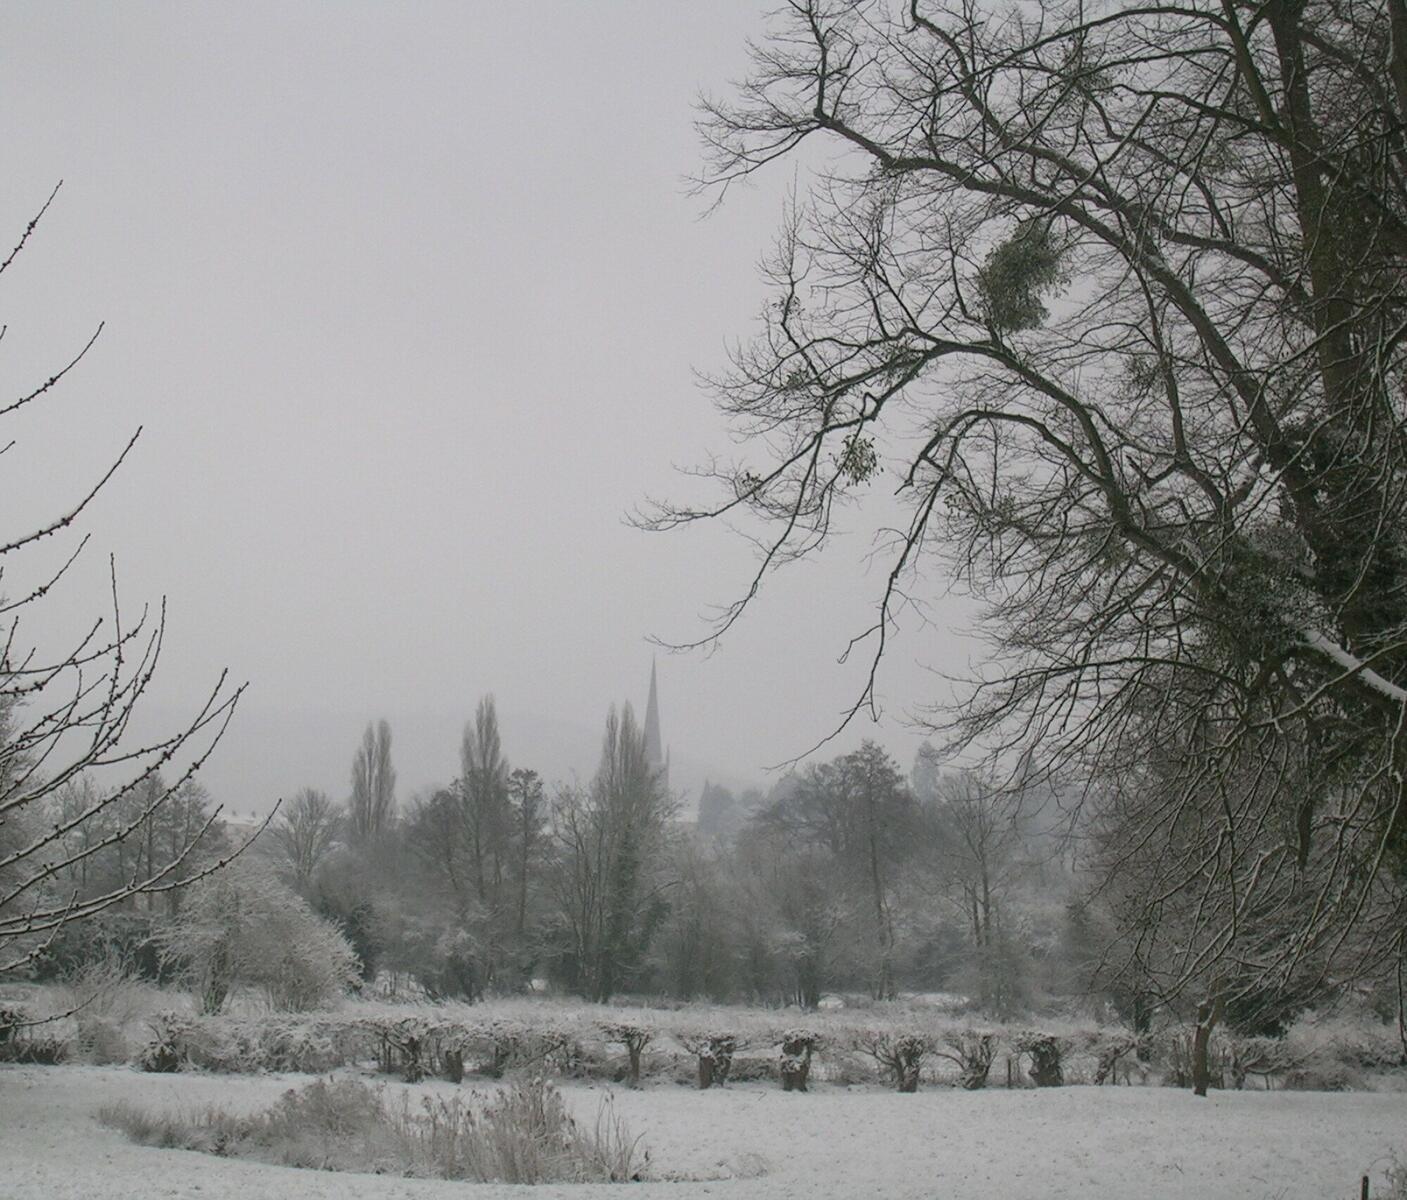 Benhall in snow